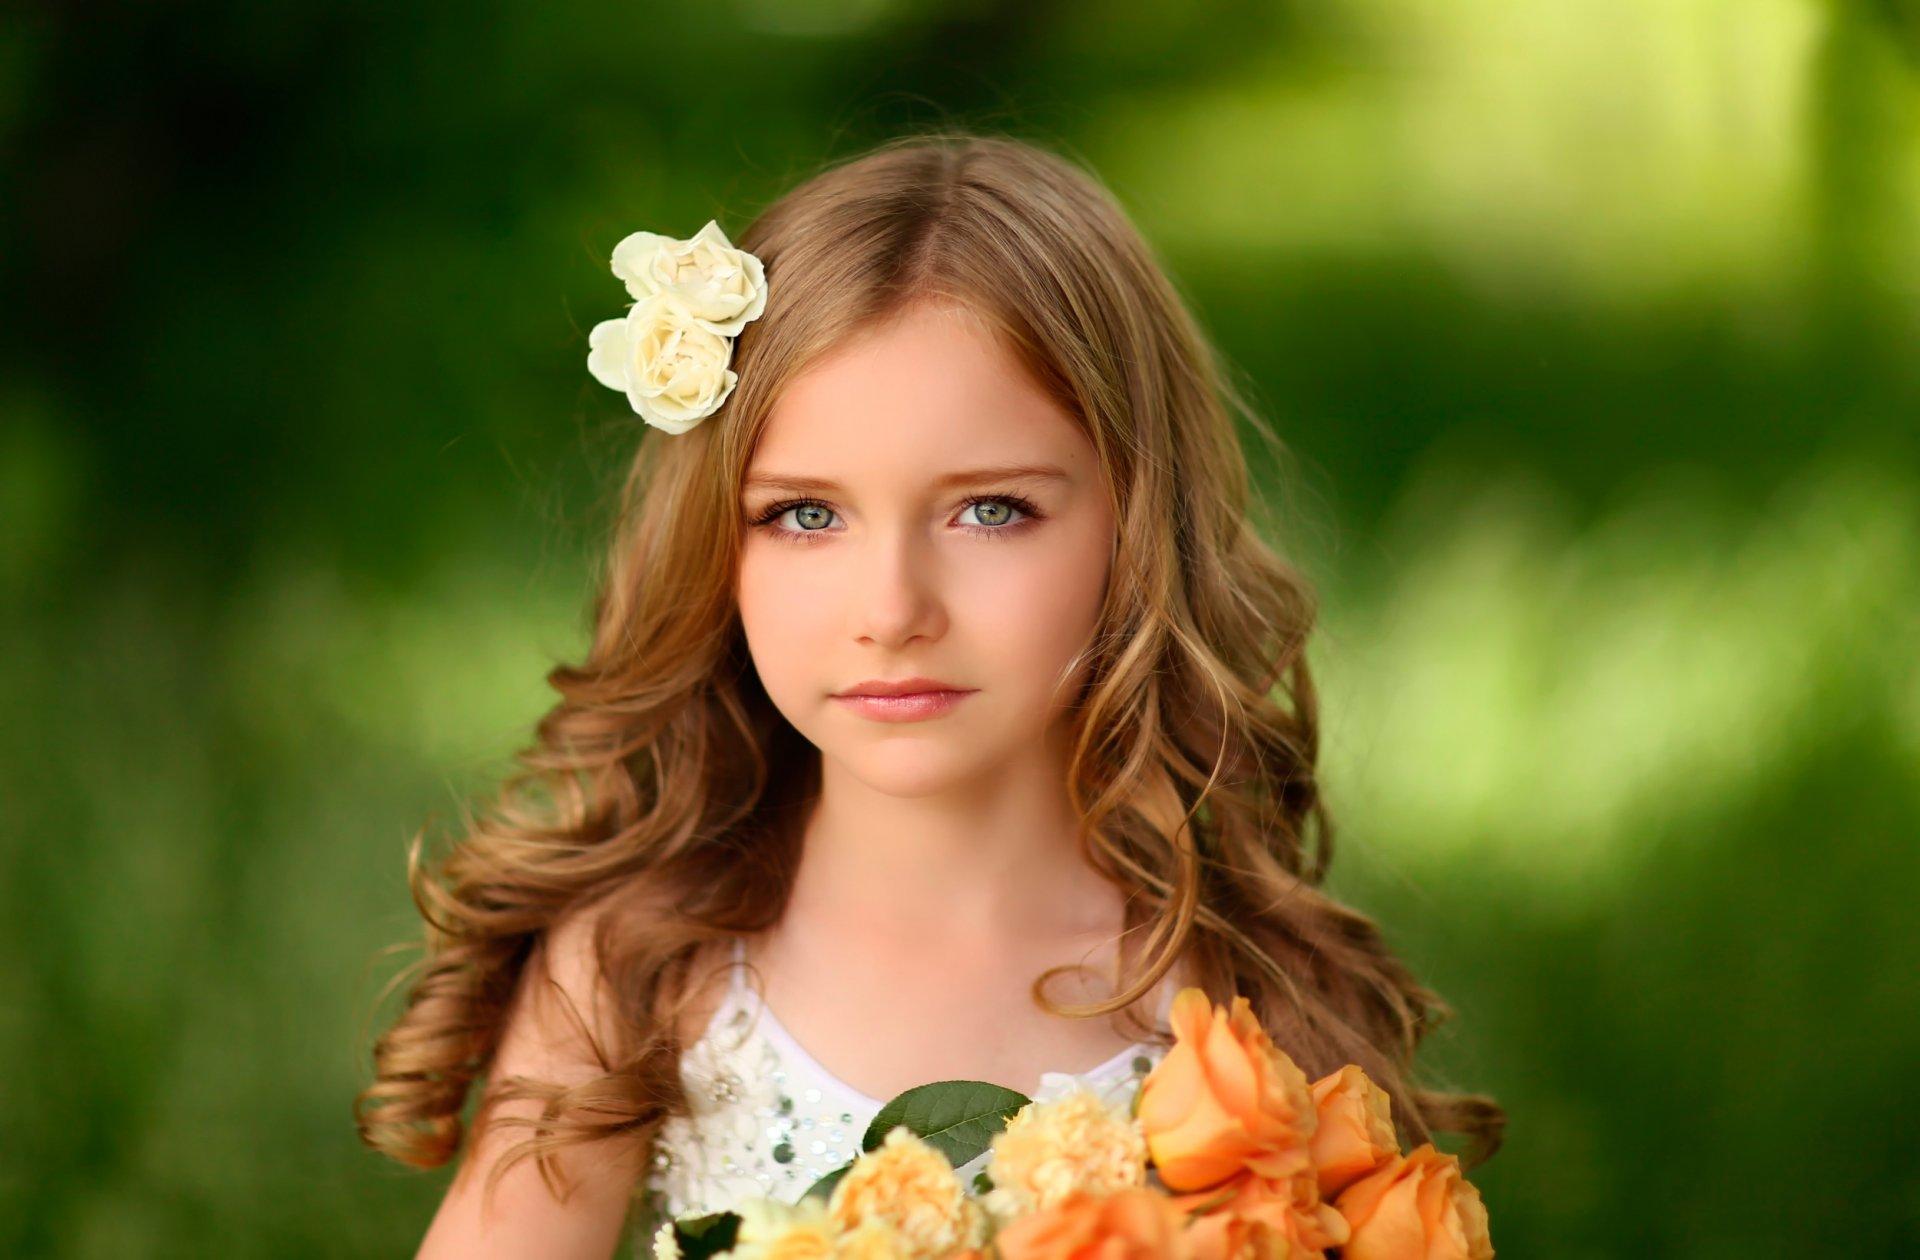 Красивые девушки фото маленькие фото